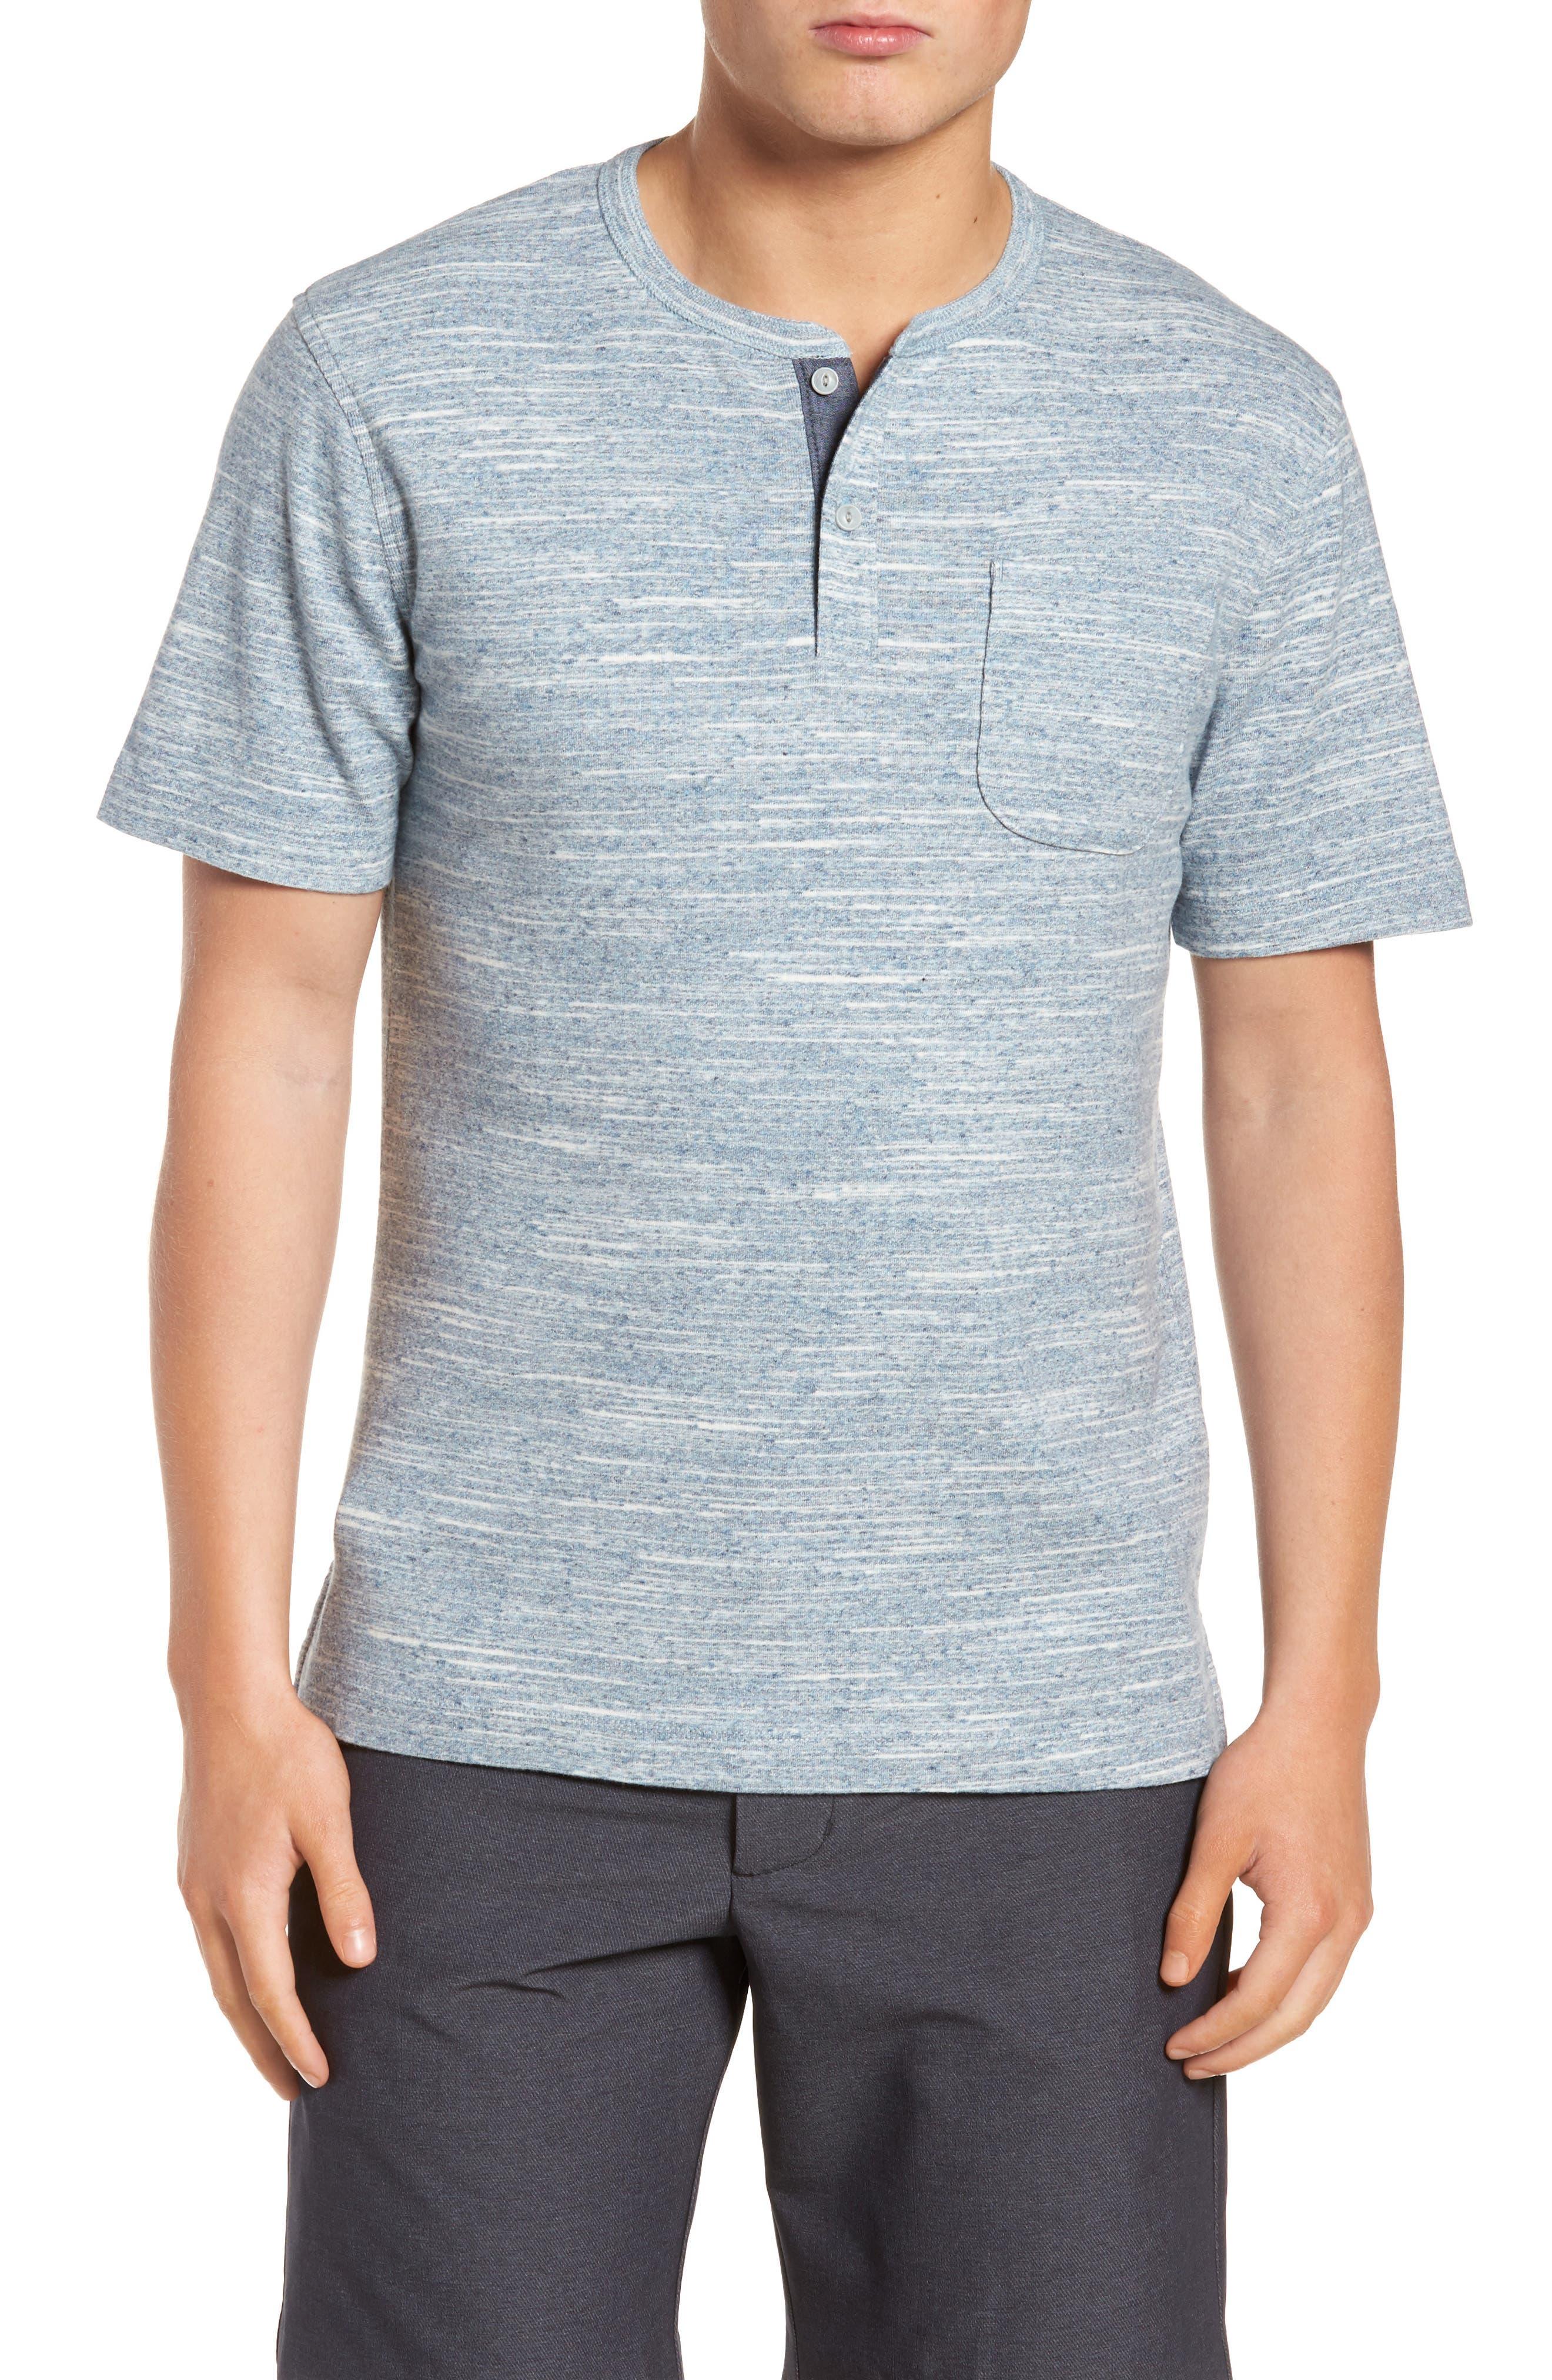 Nordstrom Men's Shop Short Sleeve Henley